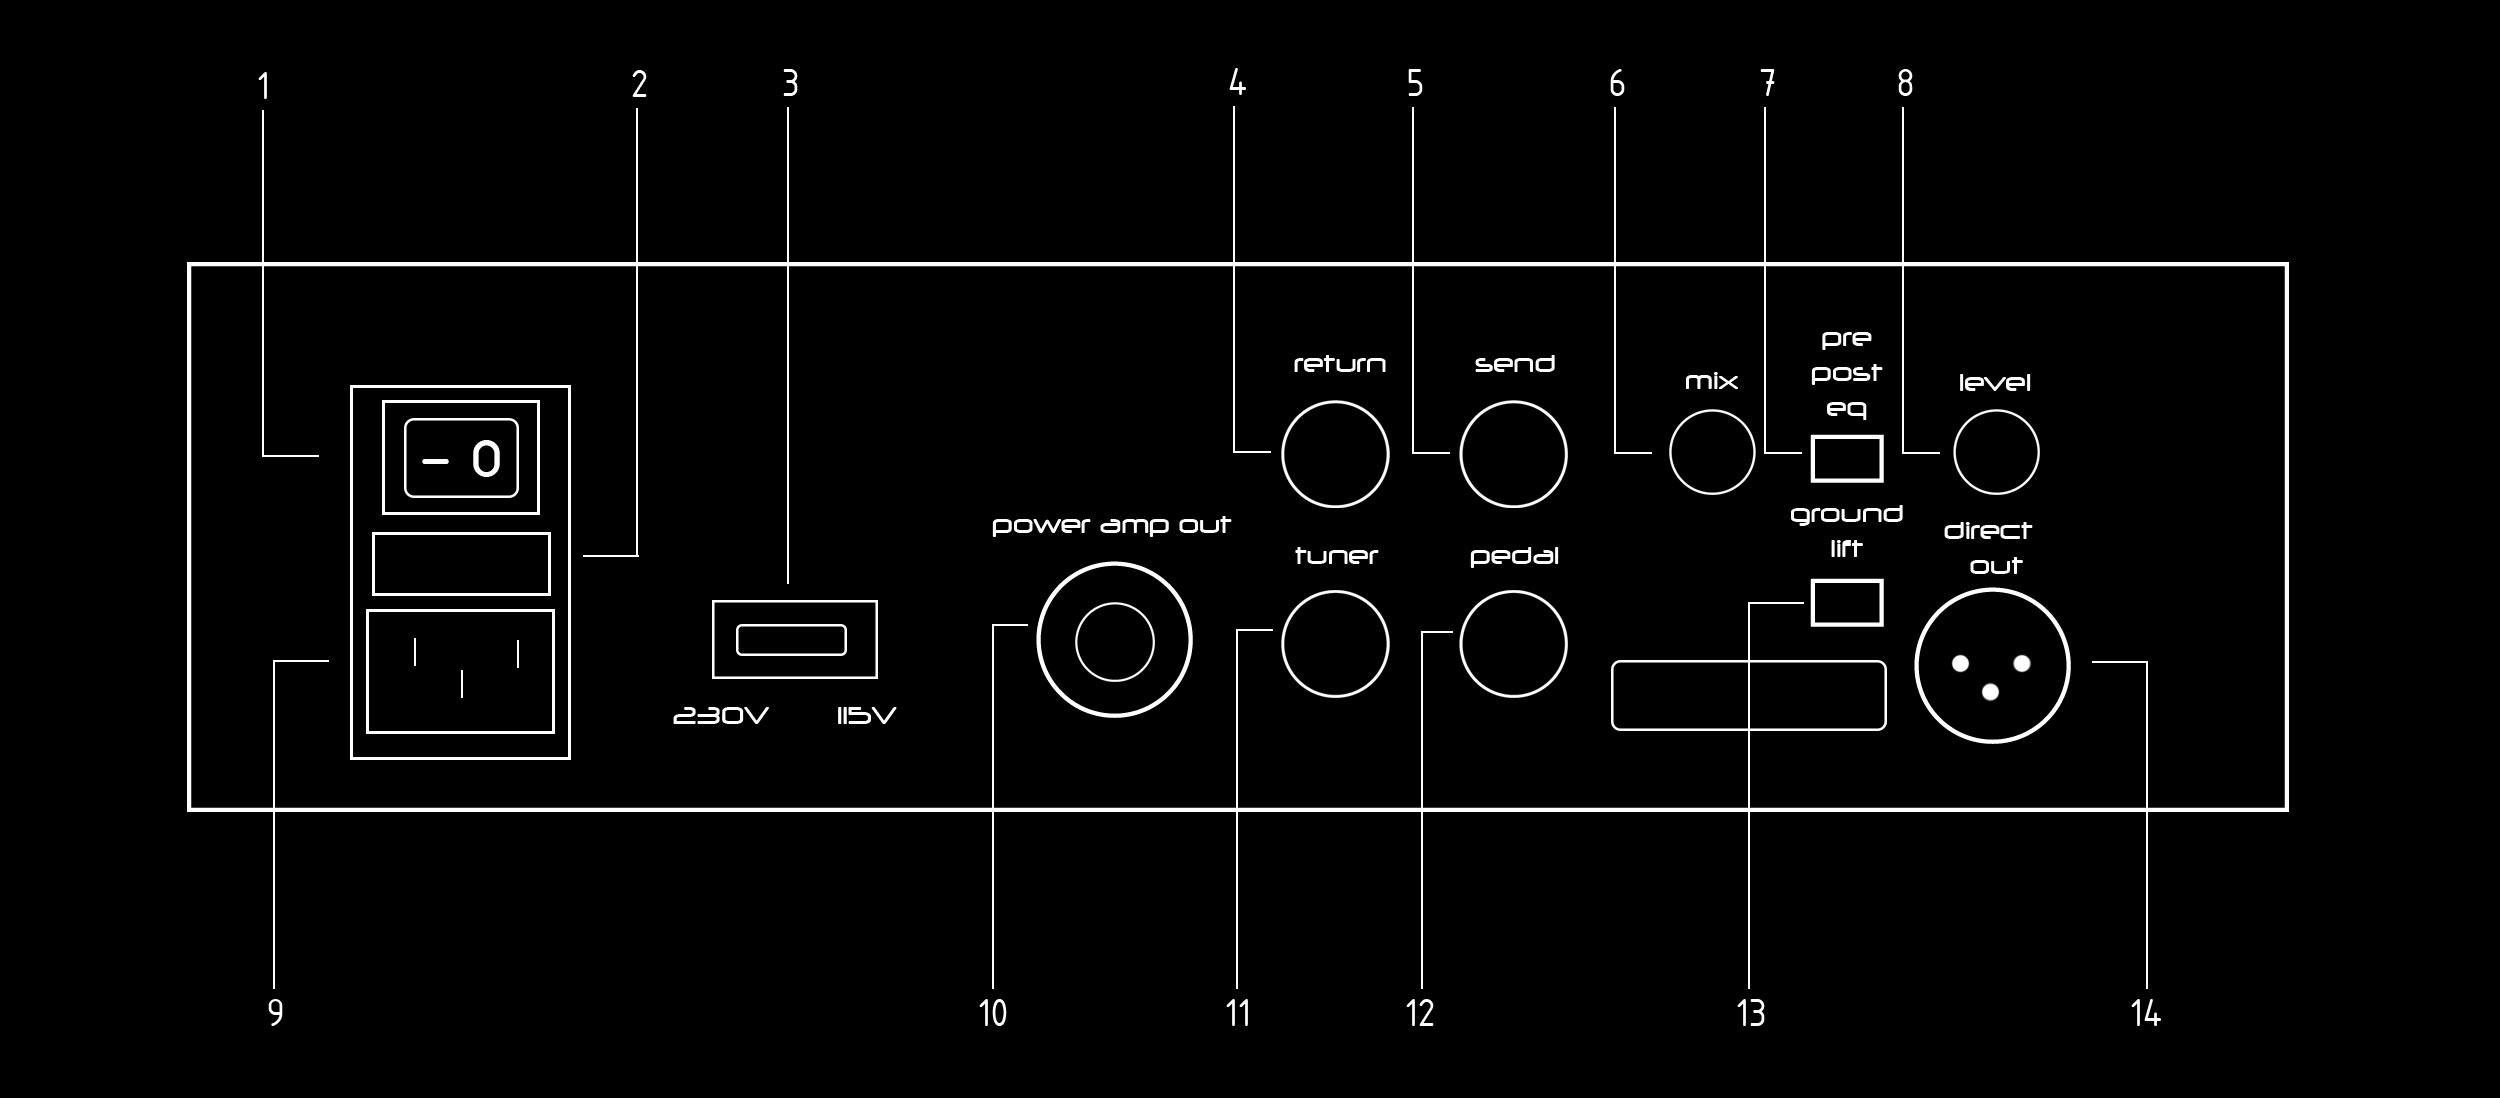 epifani-piccolo-rear-diagram.jpg